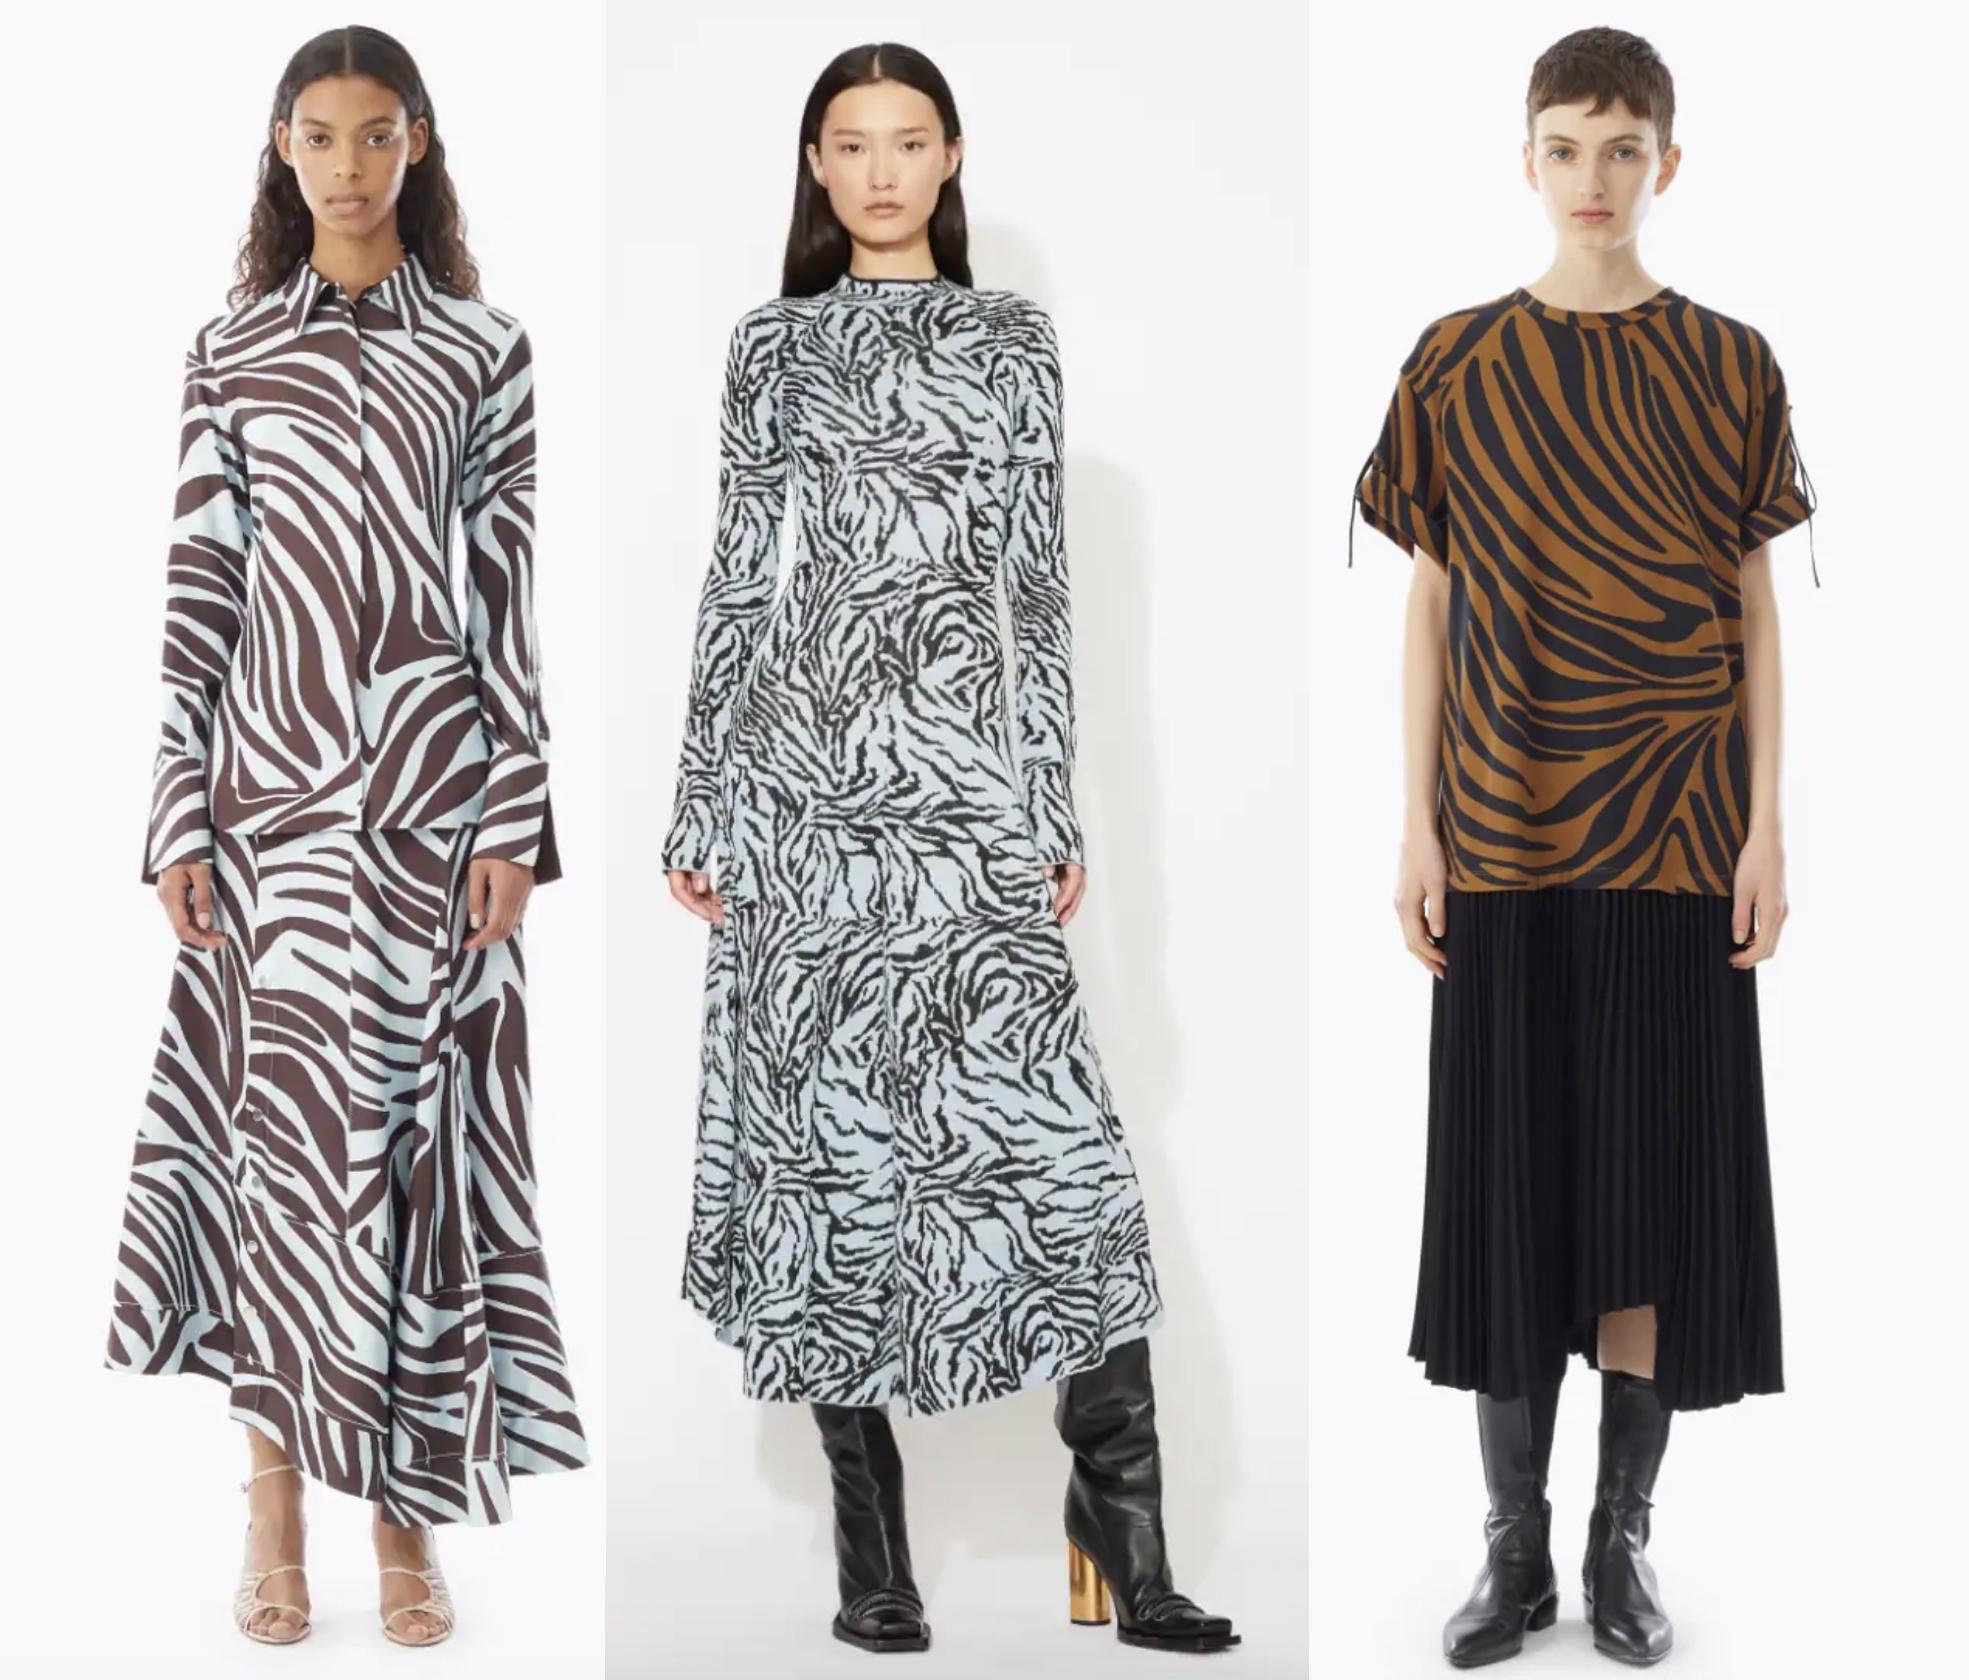 Zebra Print Blouse  and Skirt by 3.1 Phillip Lim,  Zebra Jacquard Long Sleeve Dress  by Proenza Schouler, and  Pleated Zebra Print T-Shirt Dress  by 3.1 Phillip Lim.